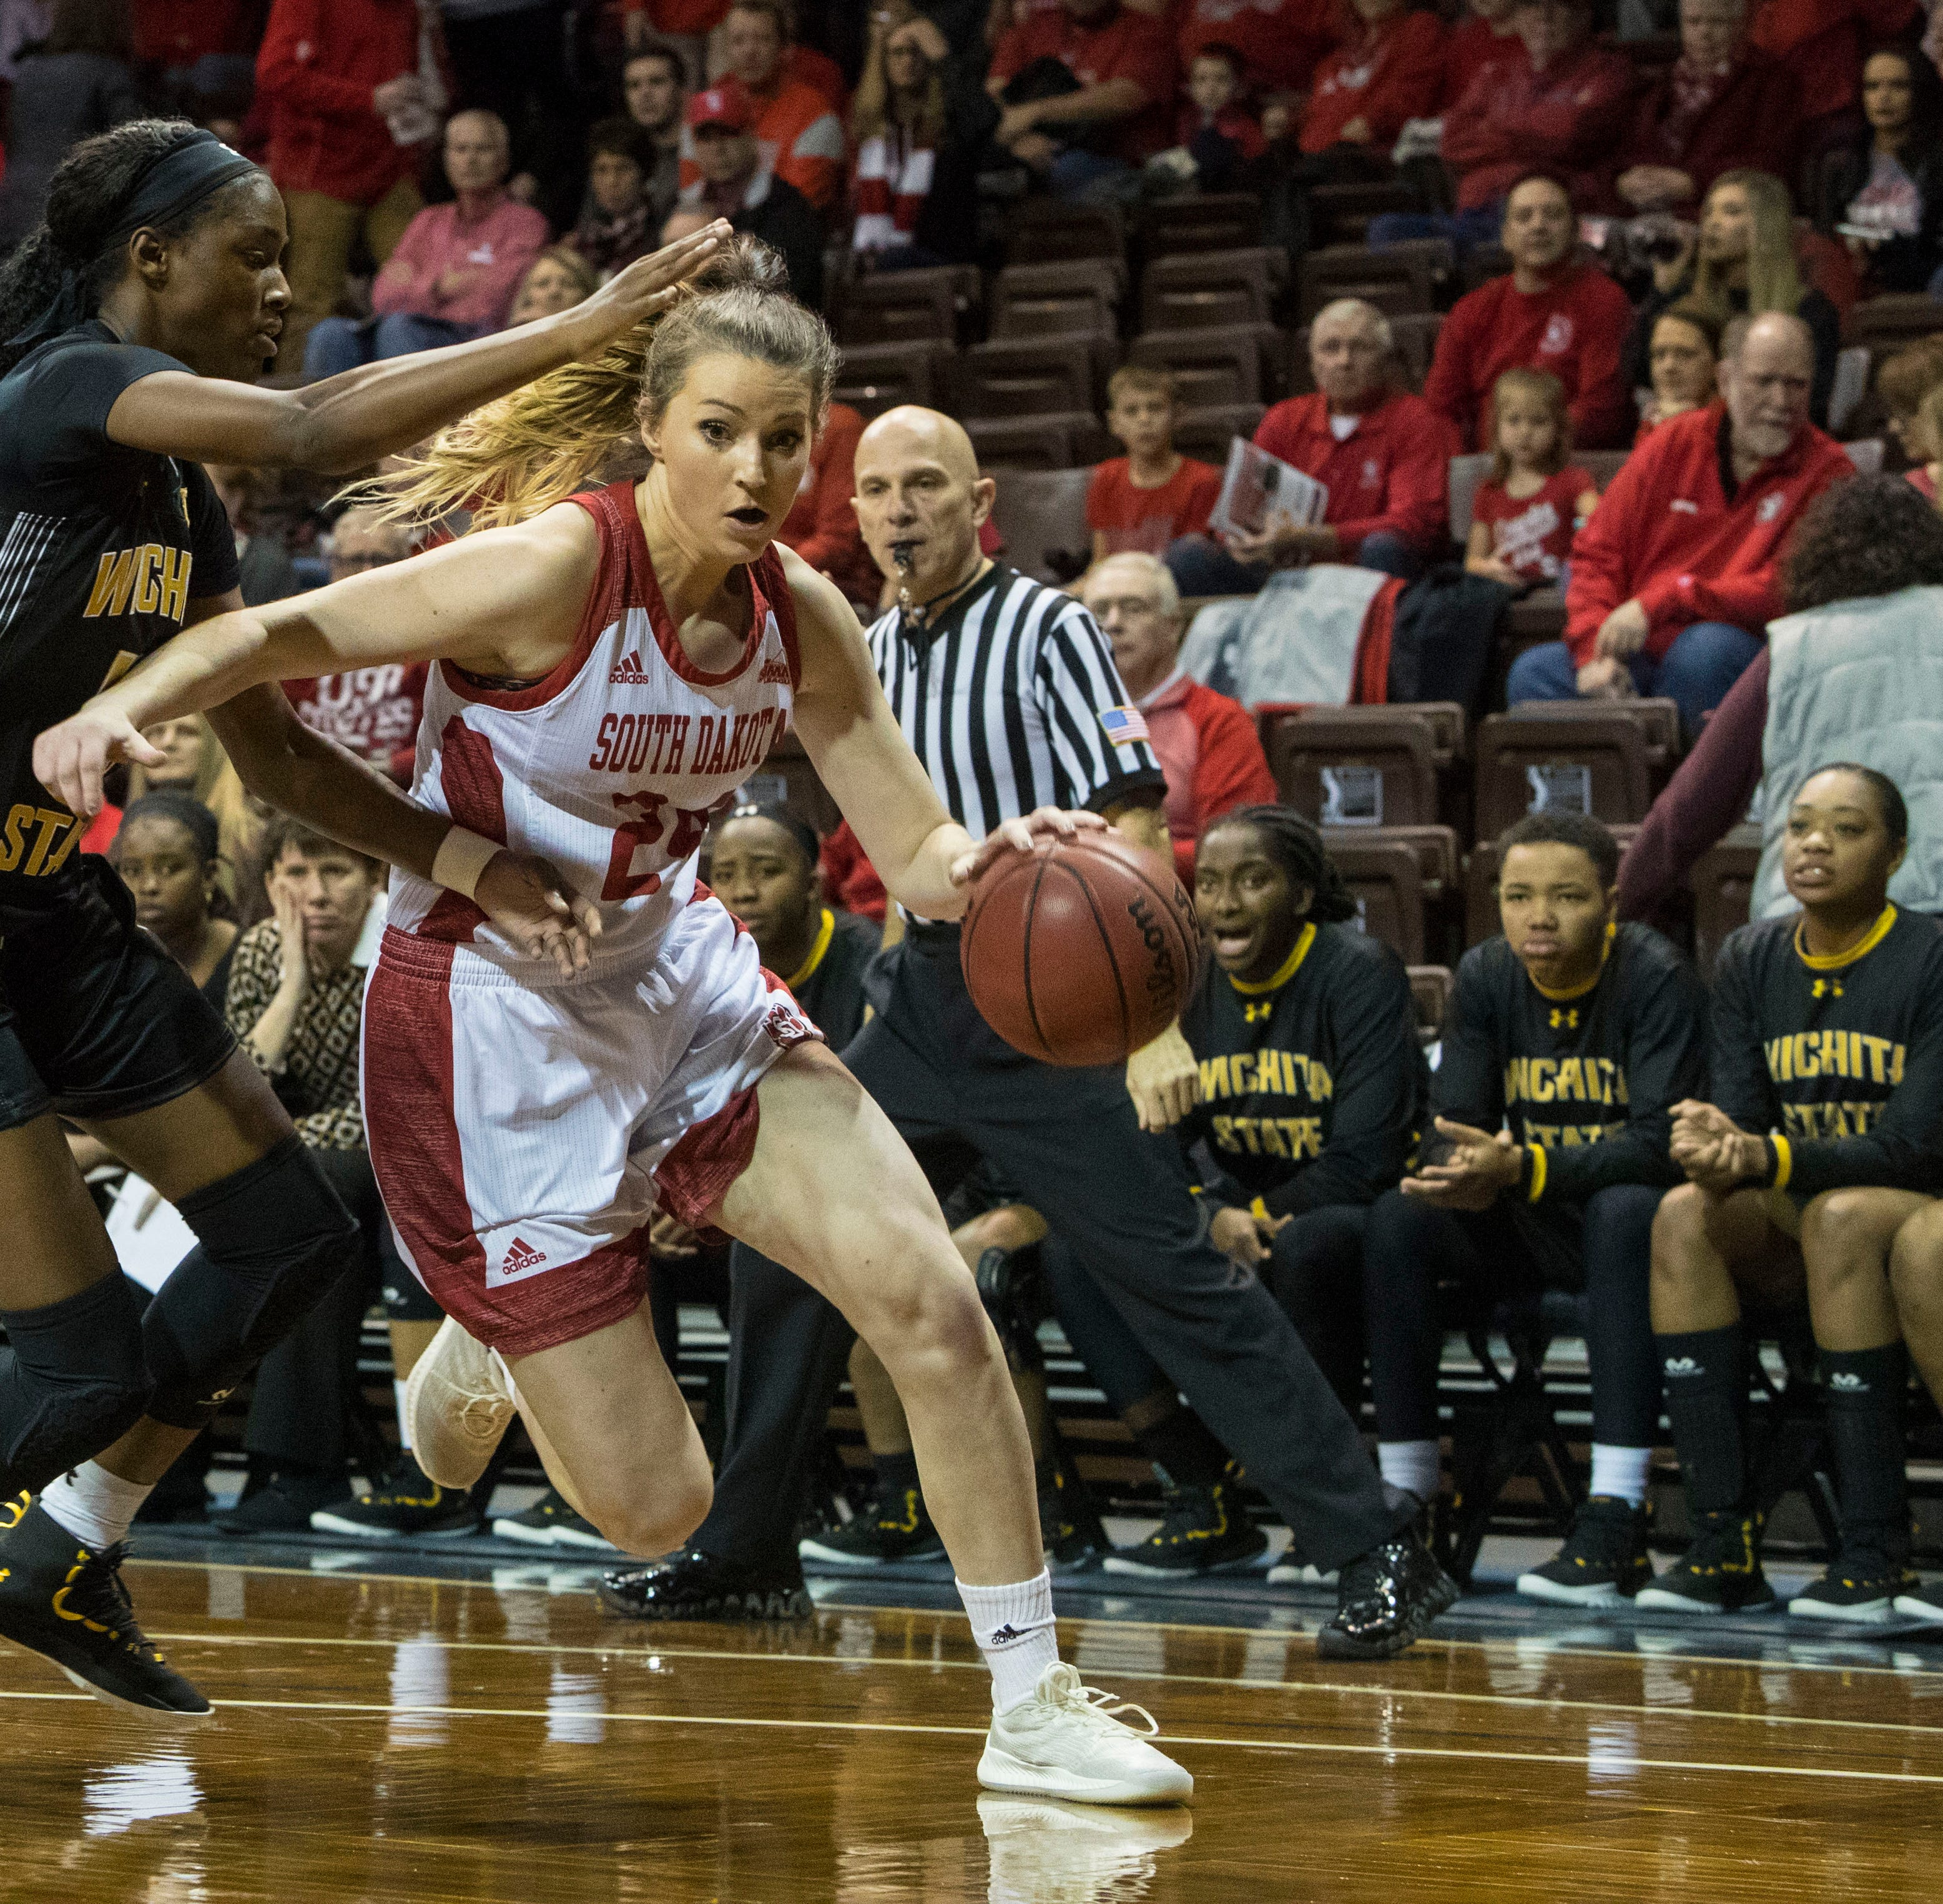 A big week for South Dakota women's basketball